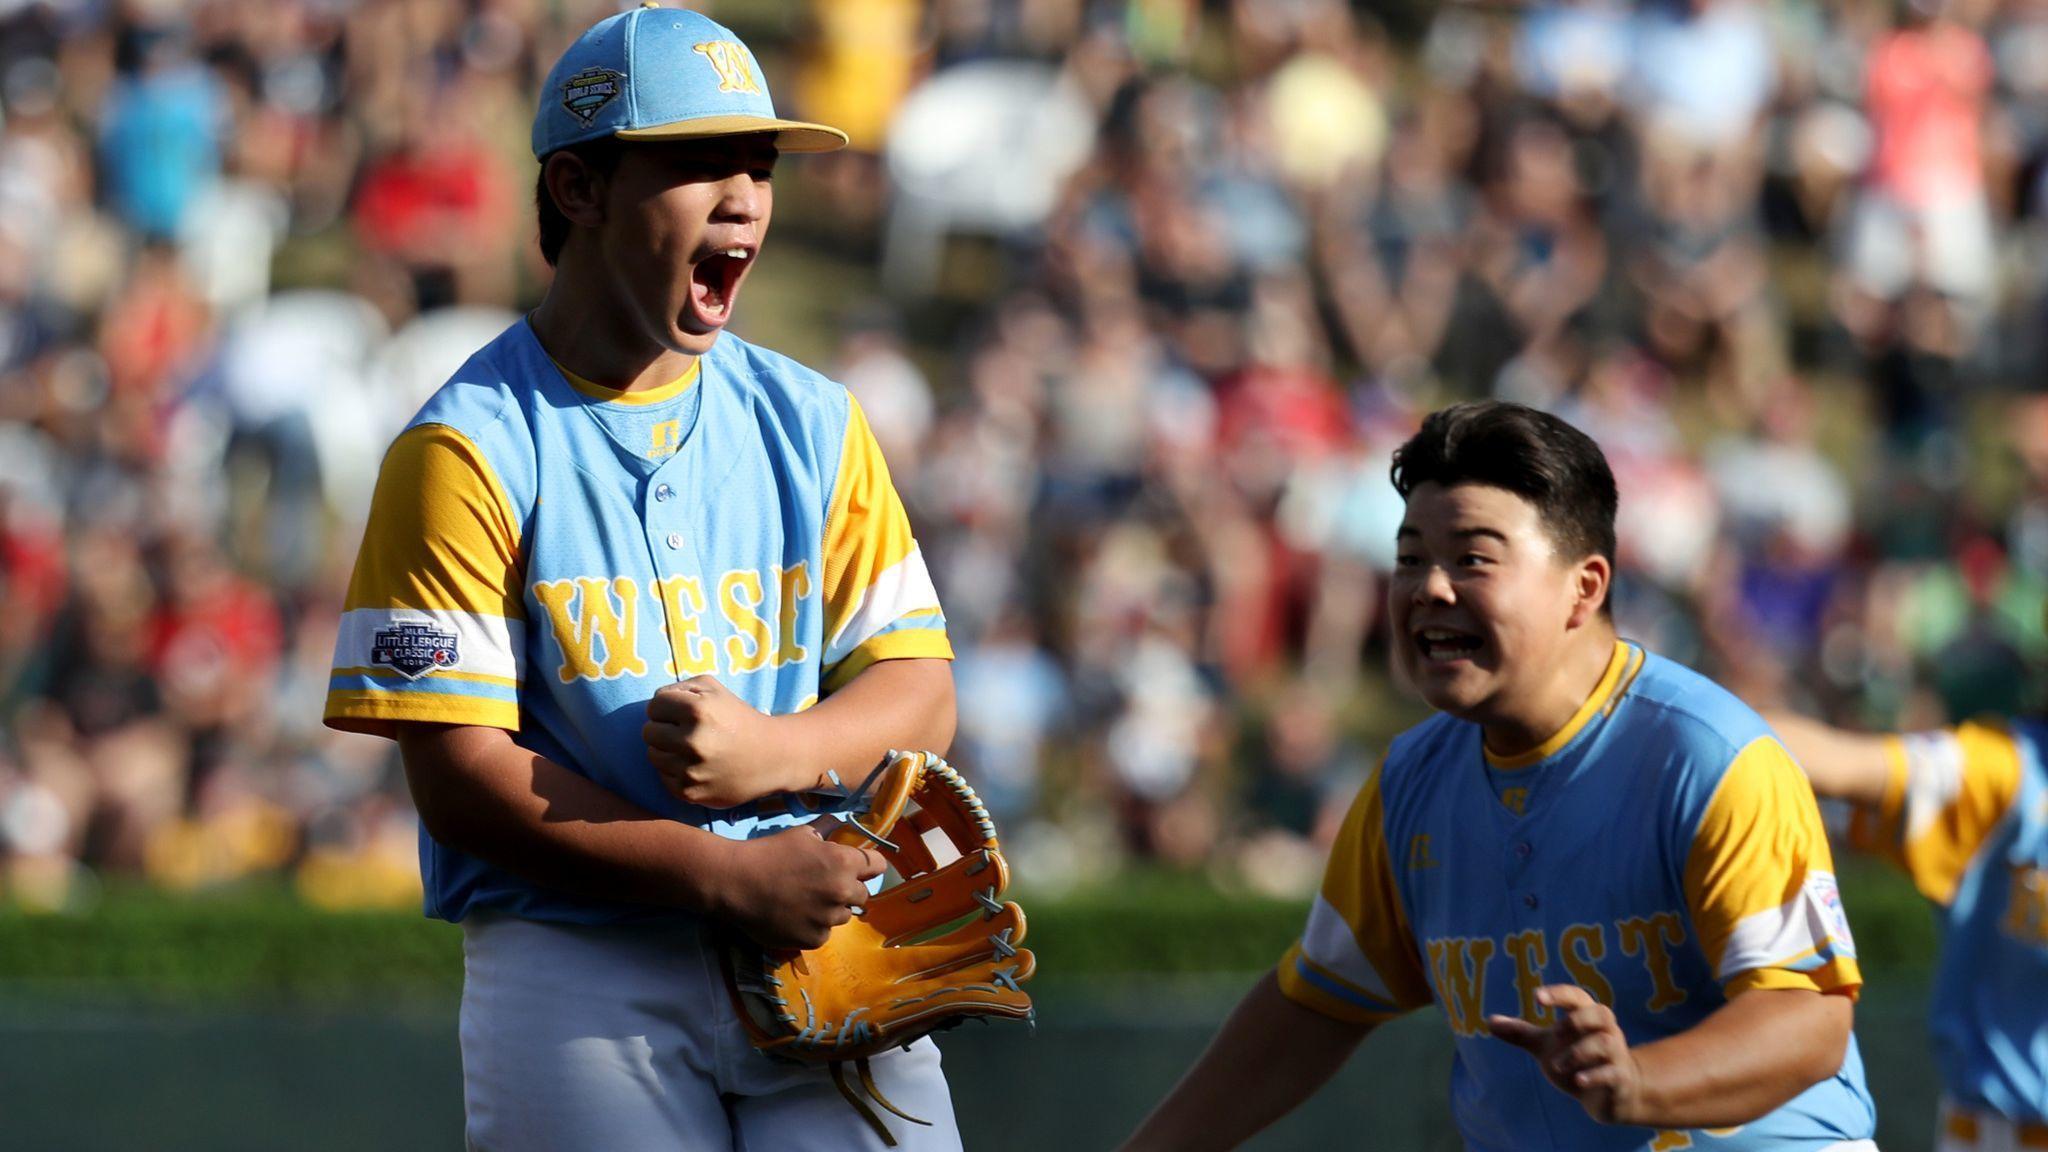 Aukai Kea strikes out 15 to lead Hawaii to Little League World Series championship game